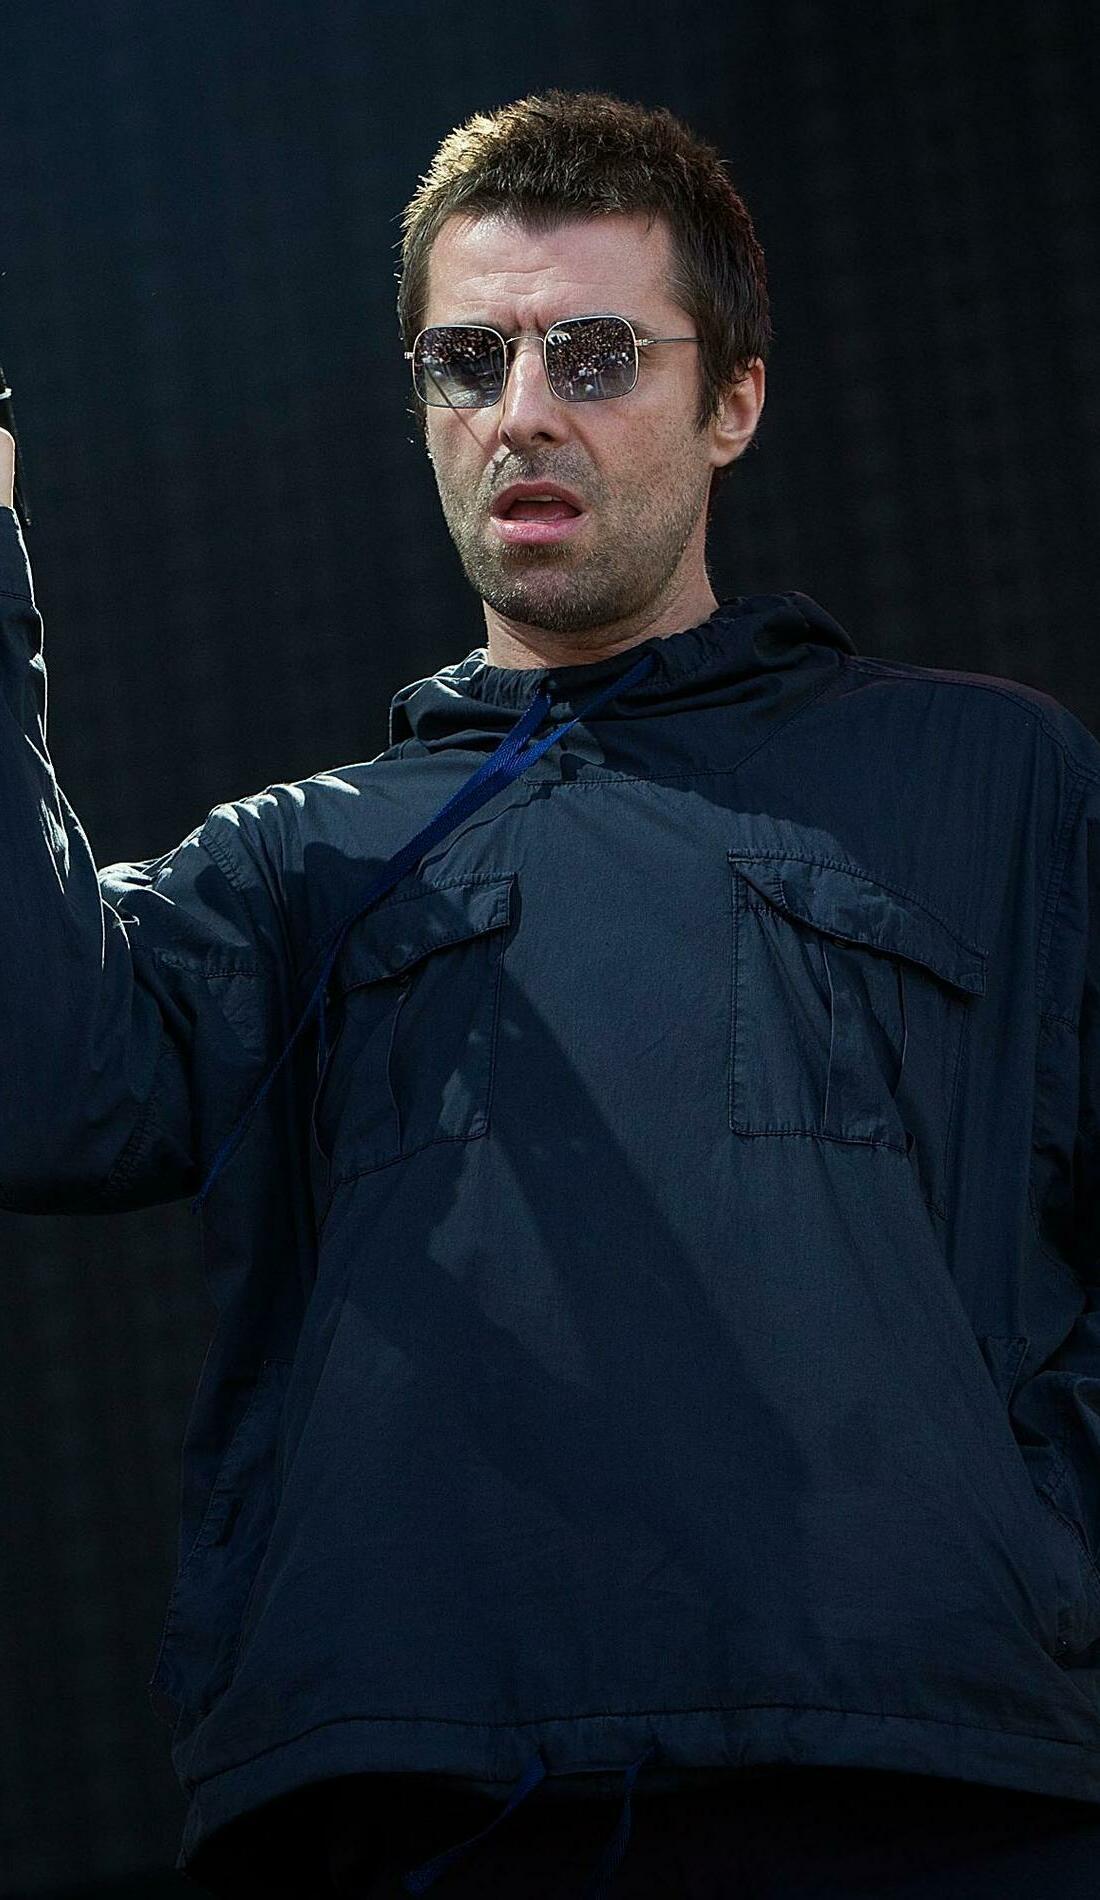 A Liam Gallagher live event